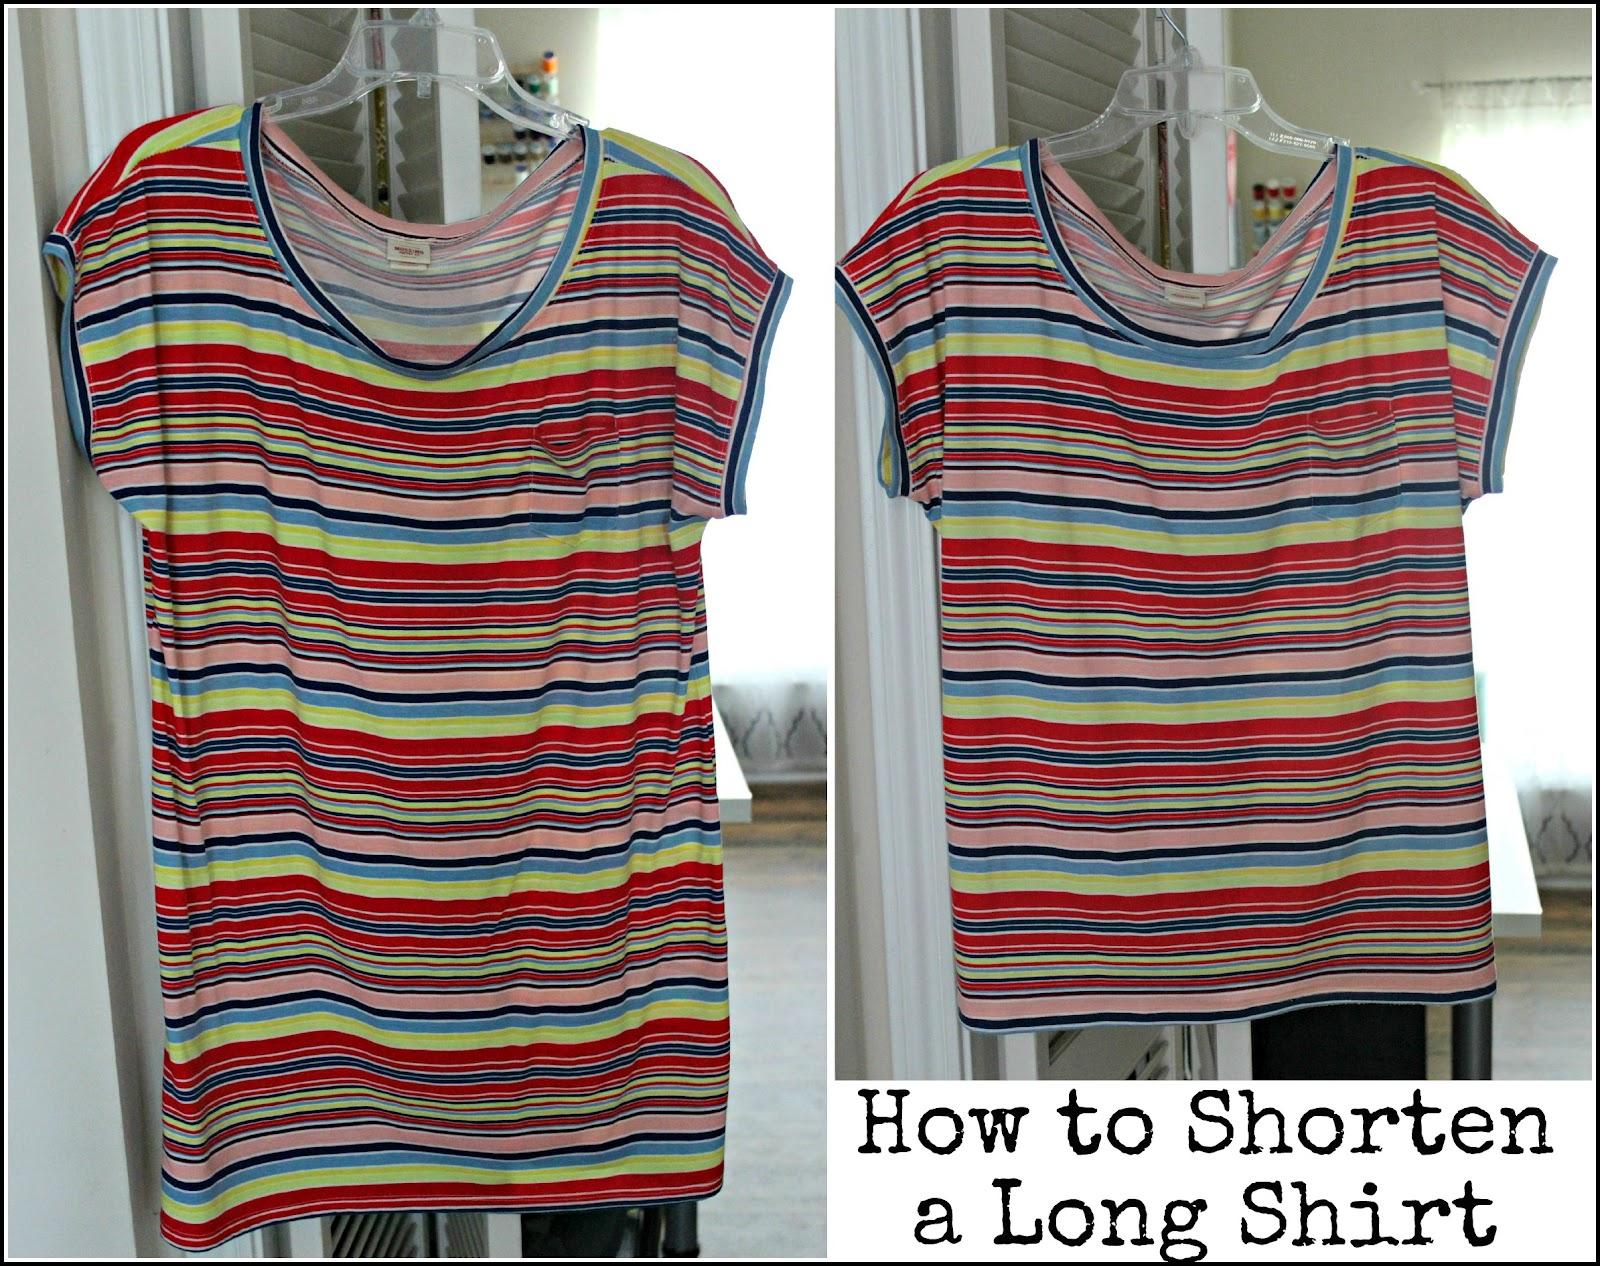 how to shorten a shirt taylormade